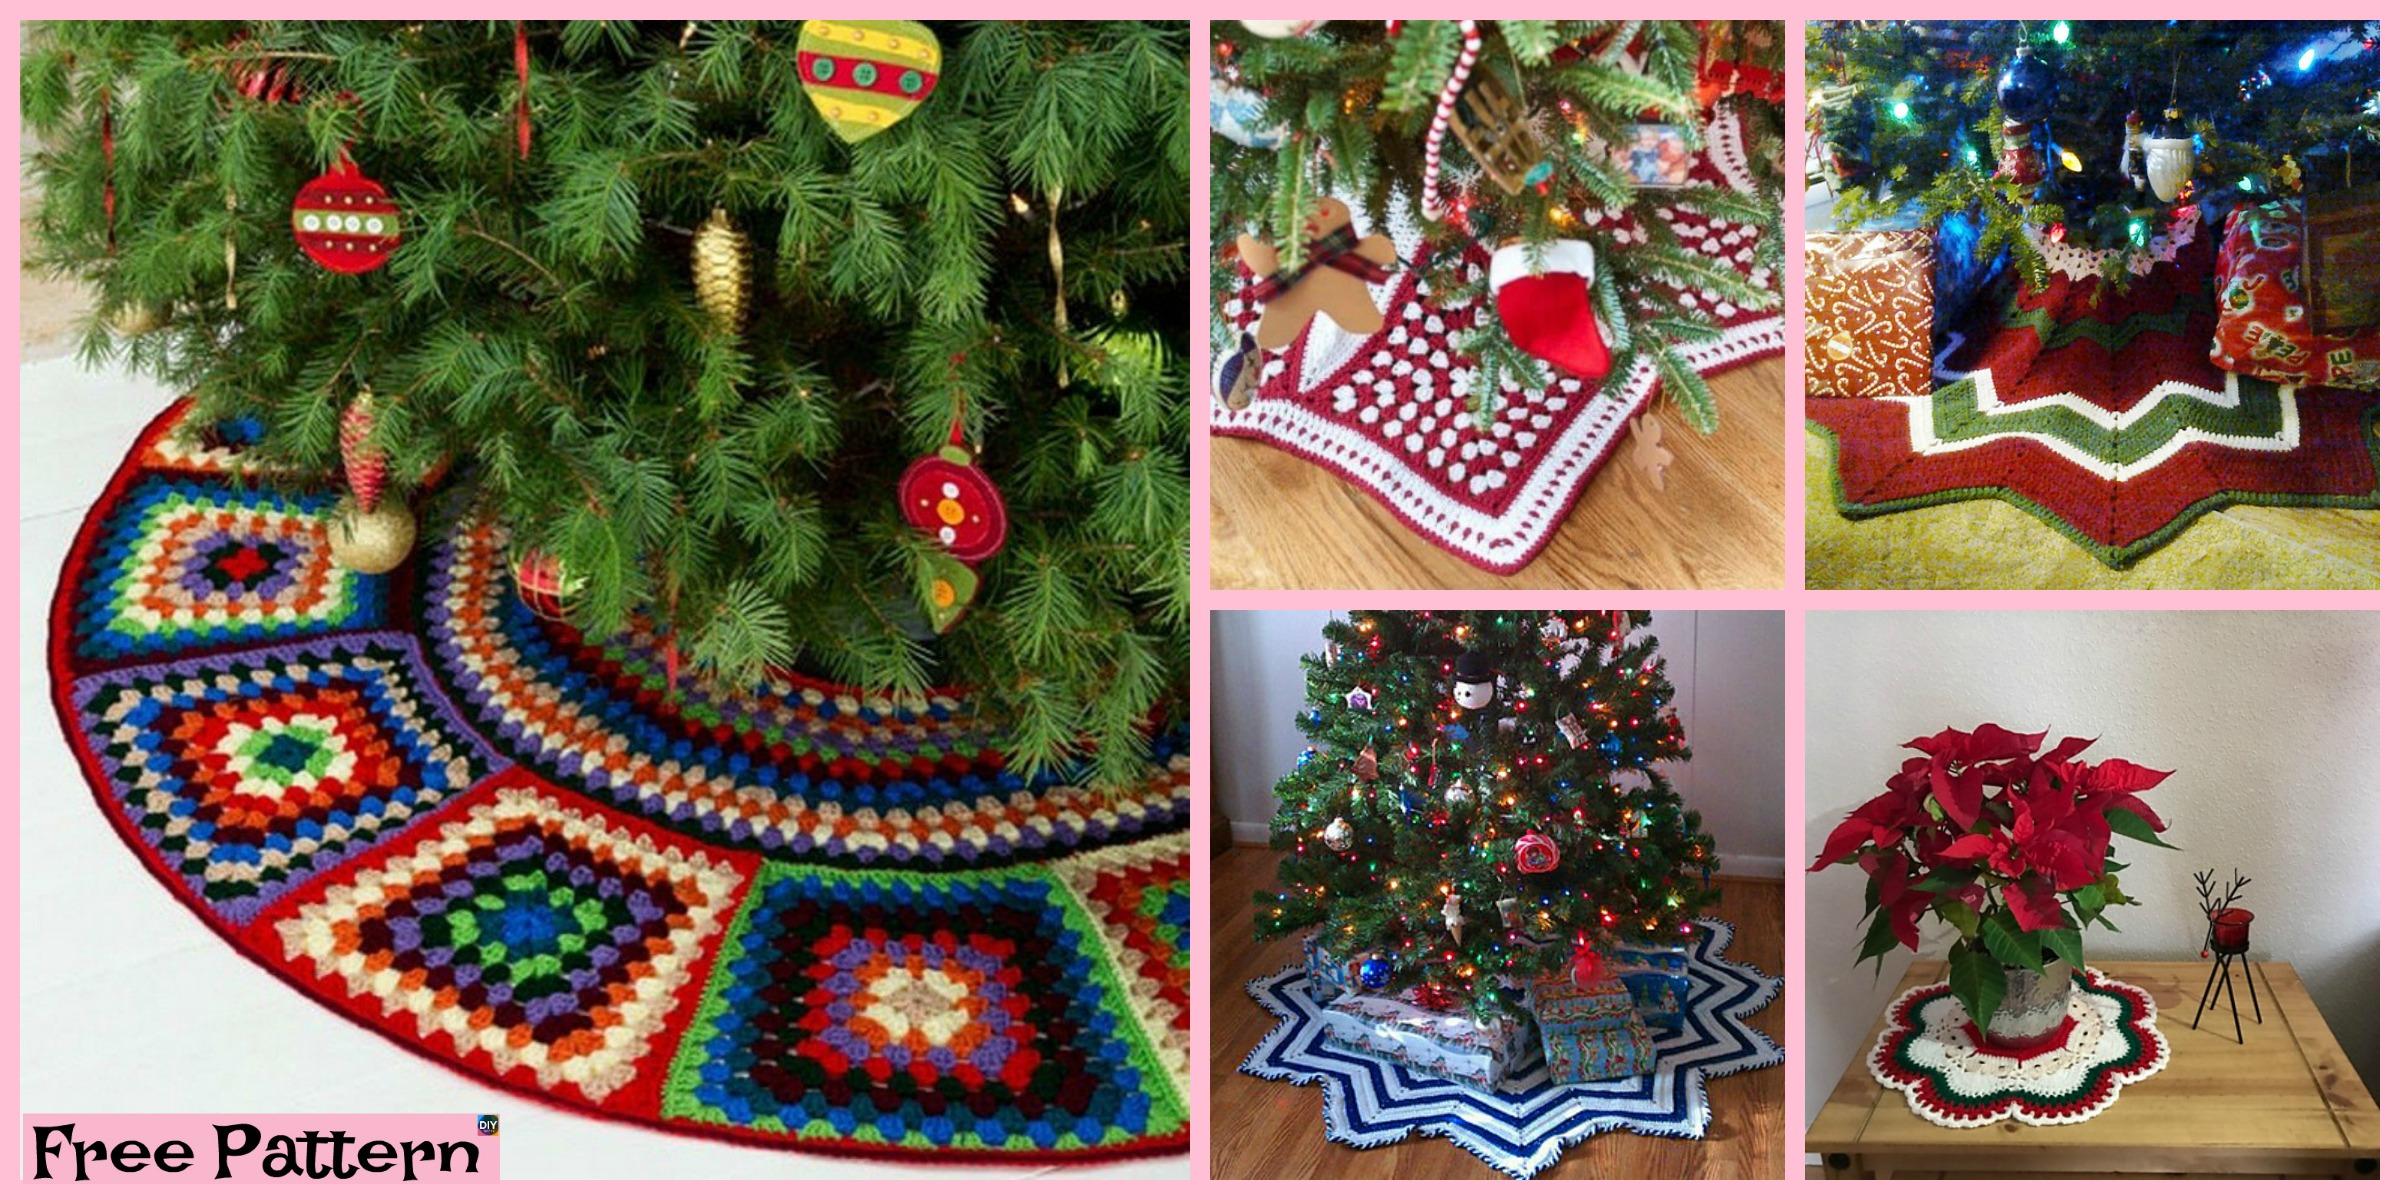 Crochet Christmas Trees Free Patterns.10 Crochet Christmas Tree Skirts Free Patterns Diy 4 Ever